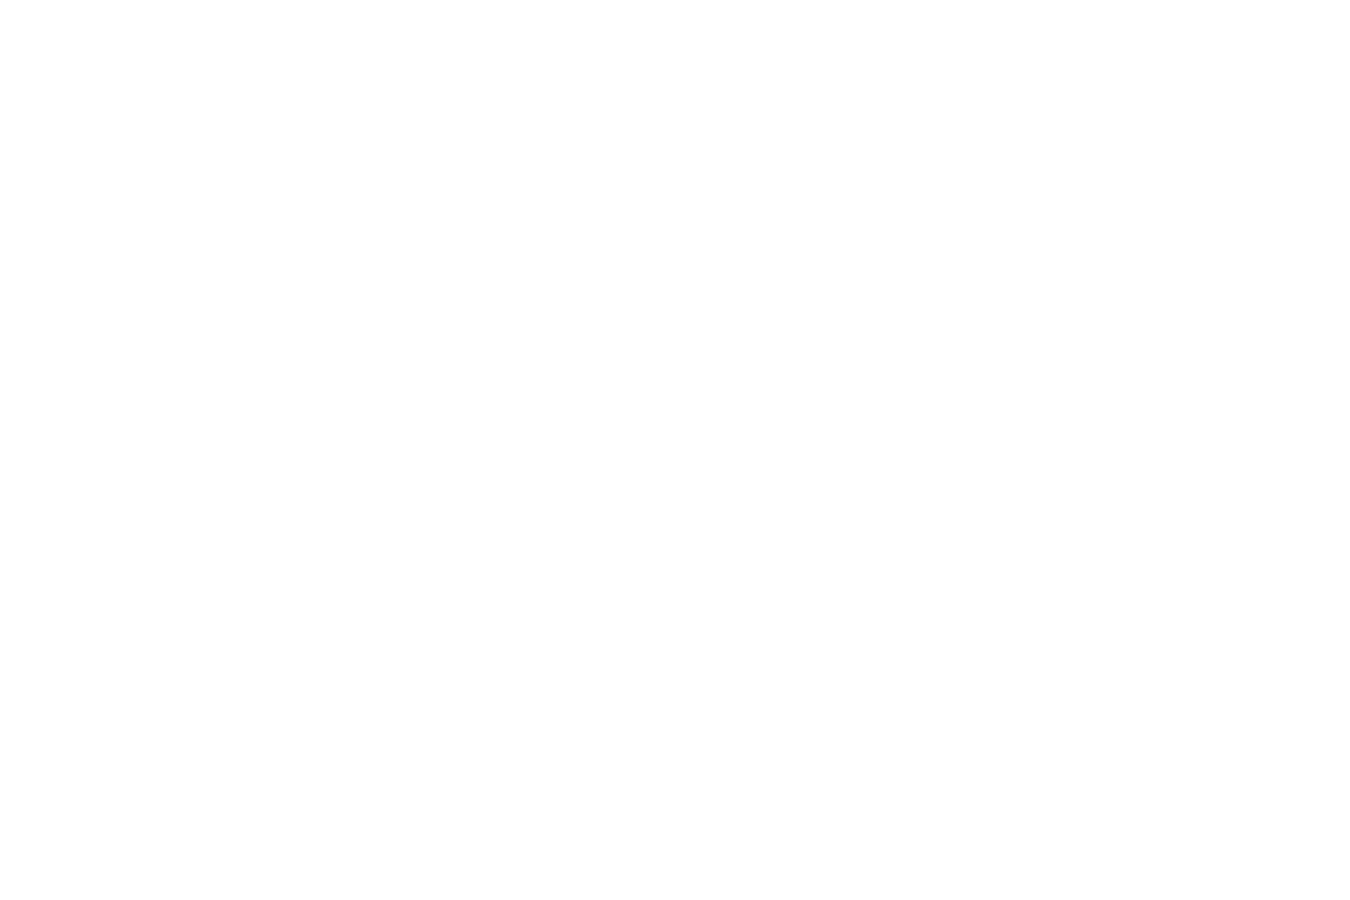 Passpective